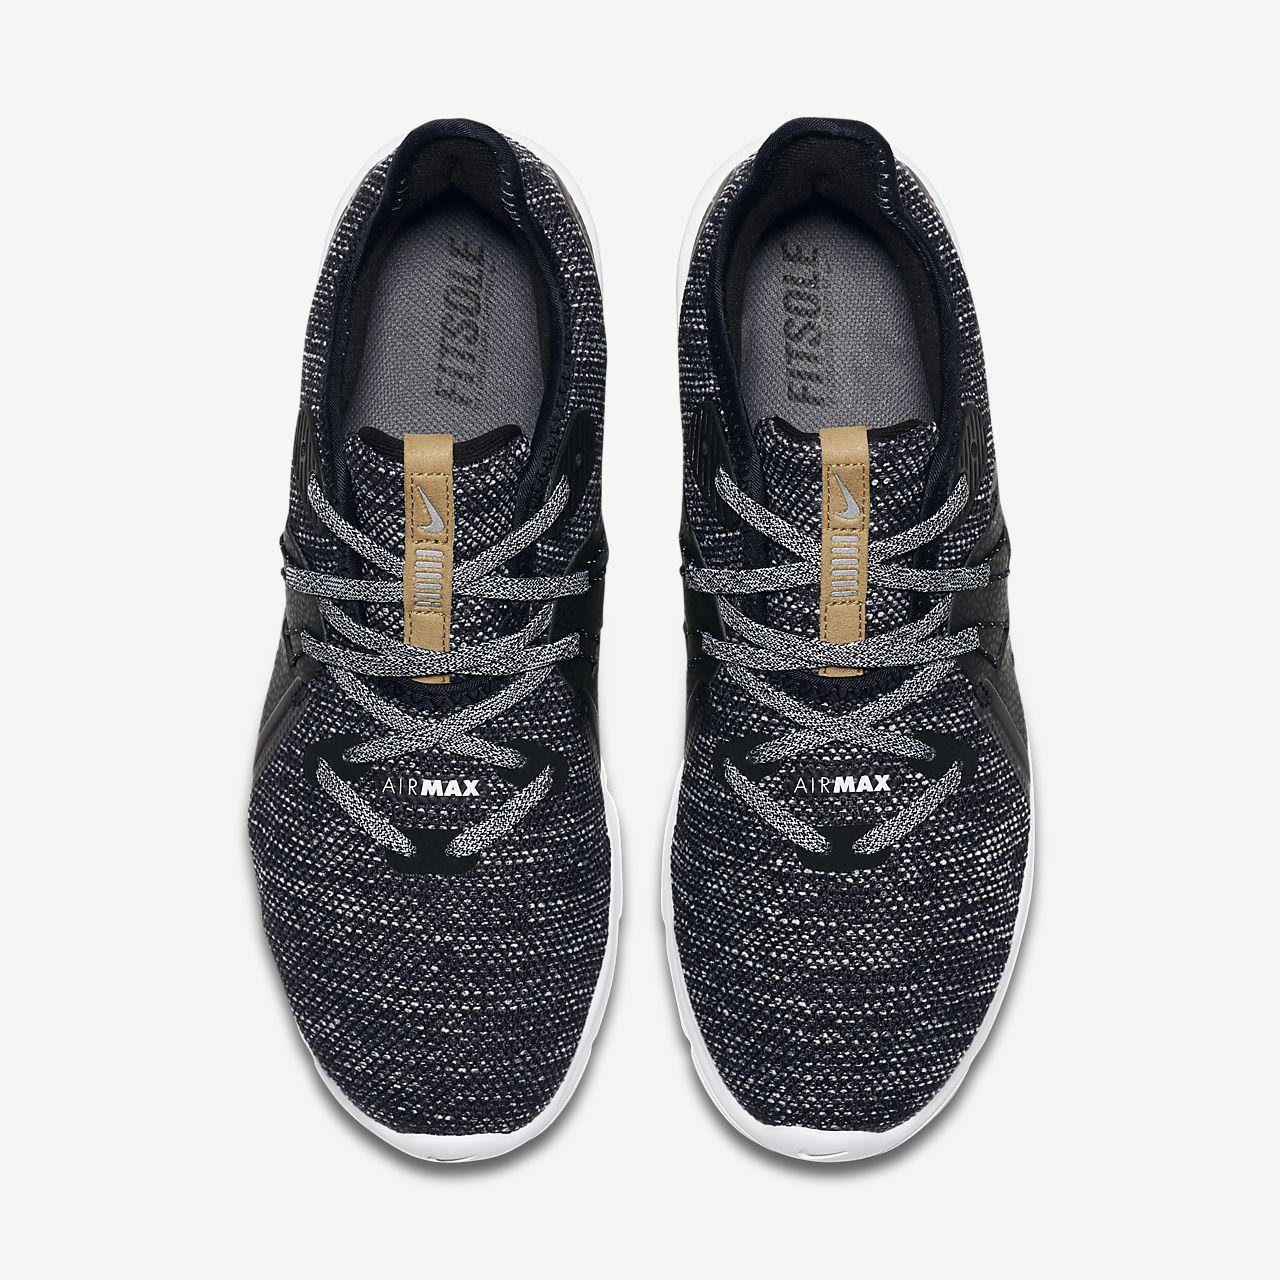 ee4a213501a6 Nike Air Max Sequent 3 Women s Shoe. Nike.com DK